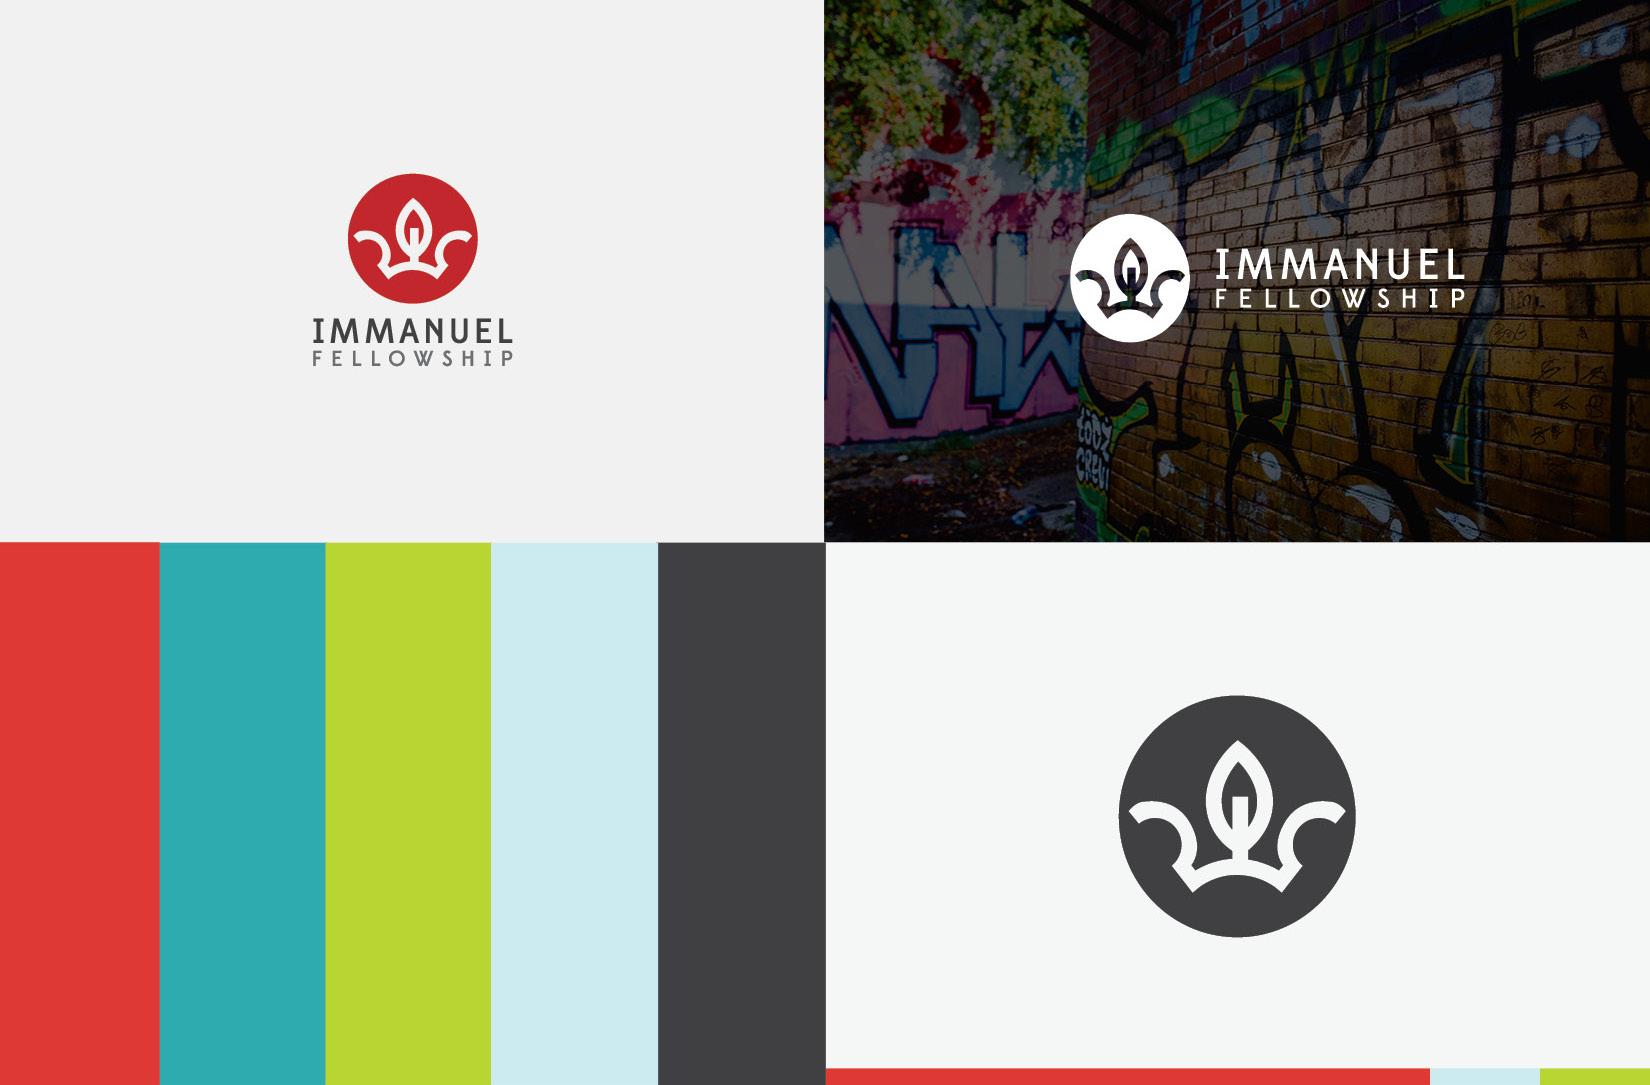 Branding_Web Images_Immanuel Fellowship32.jpg